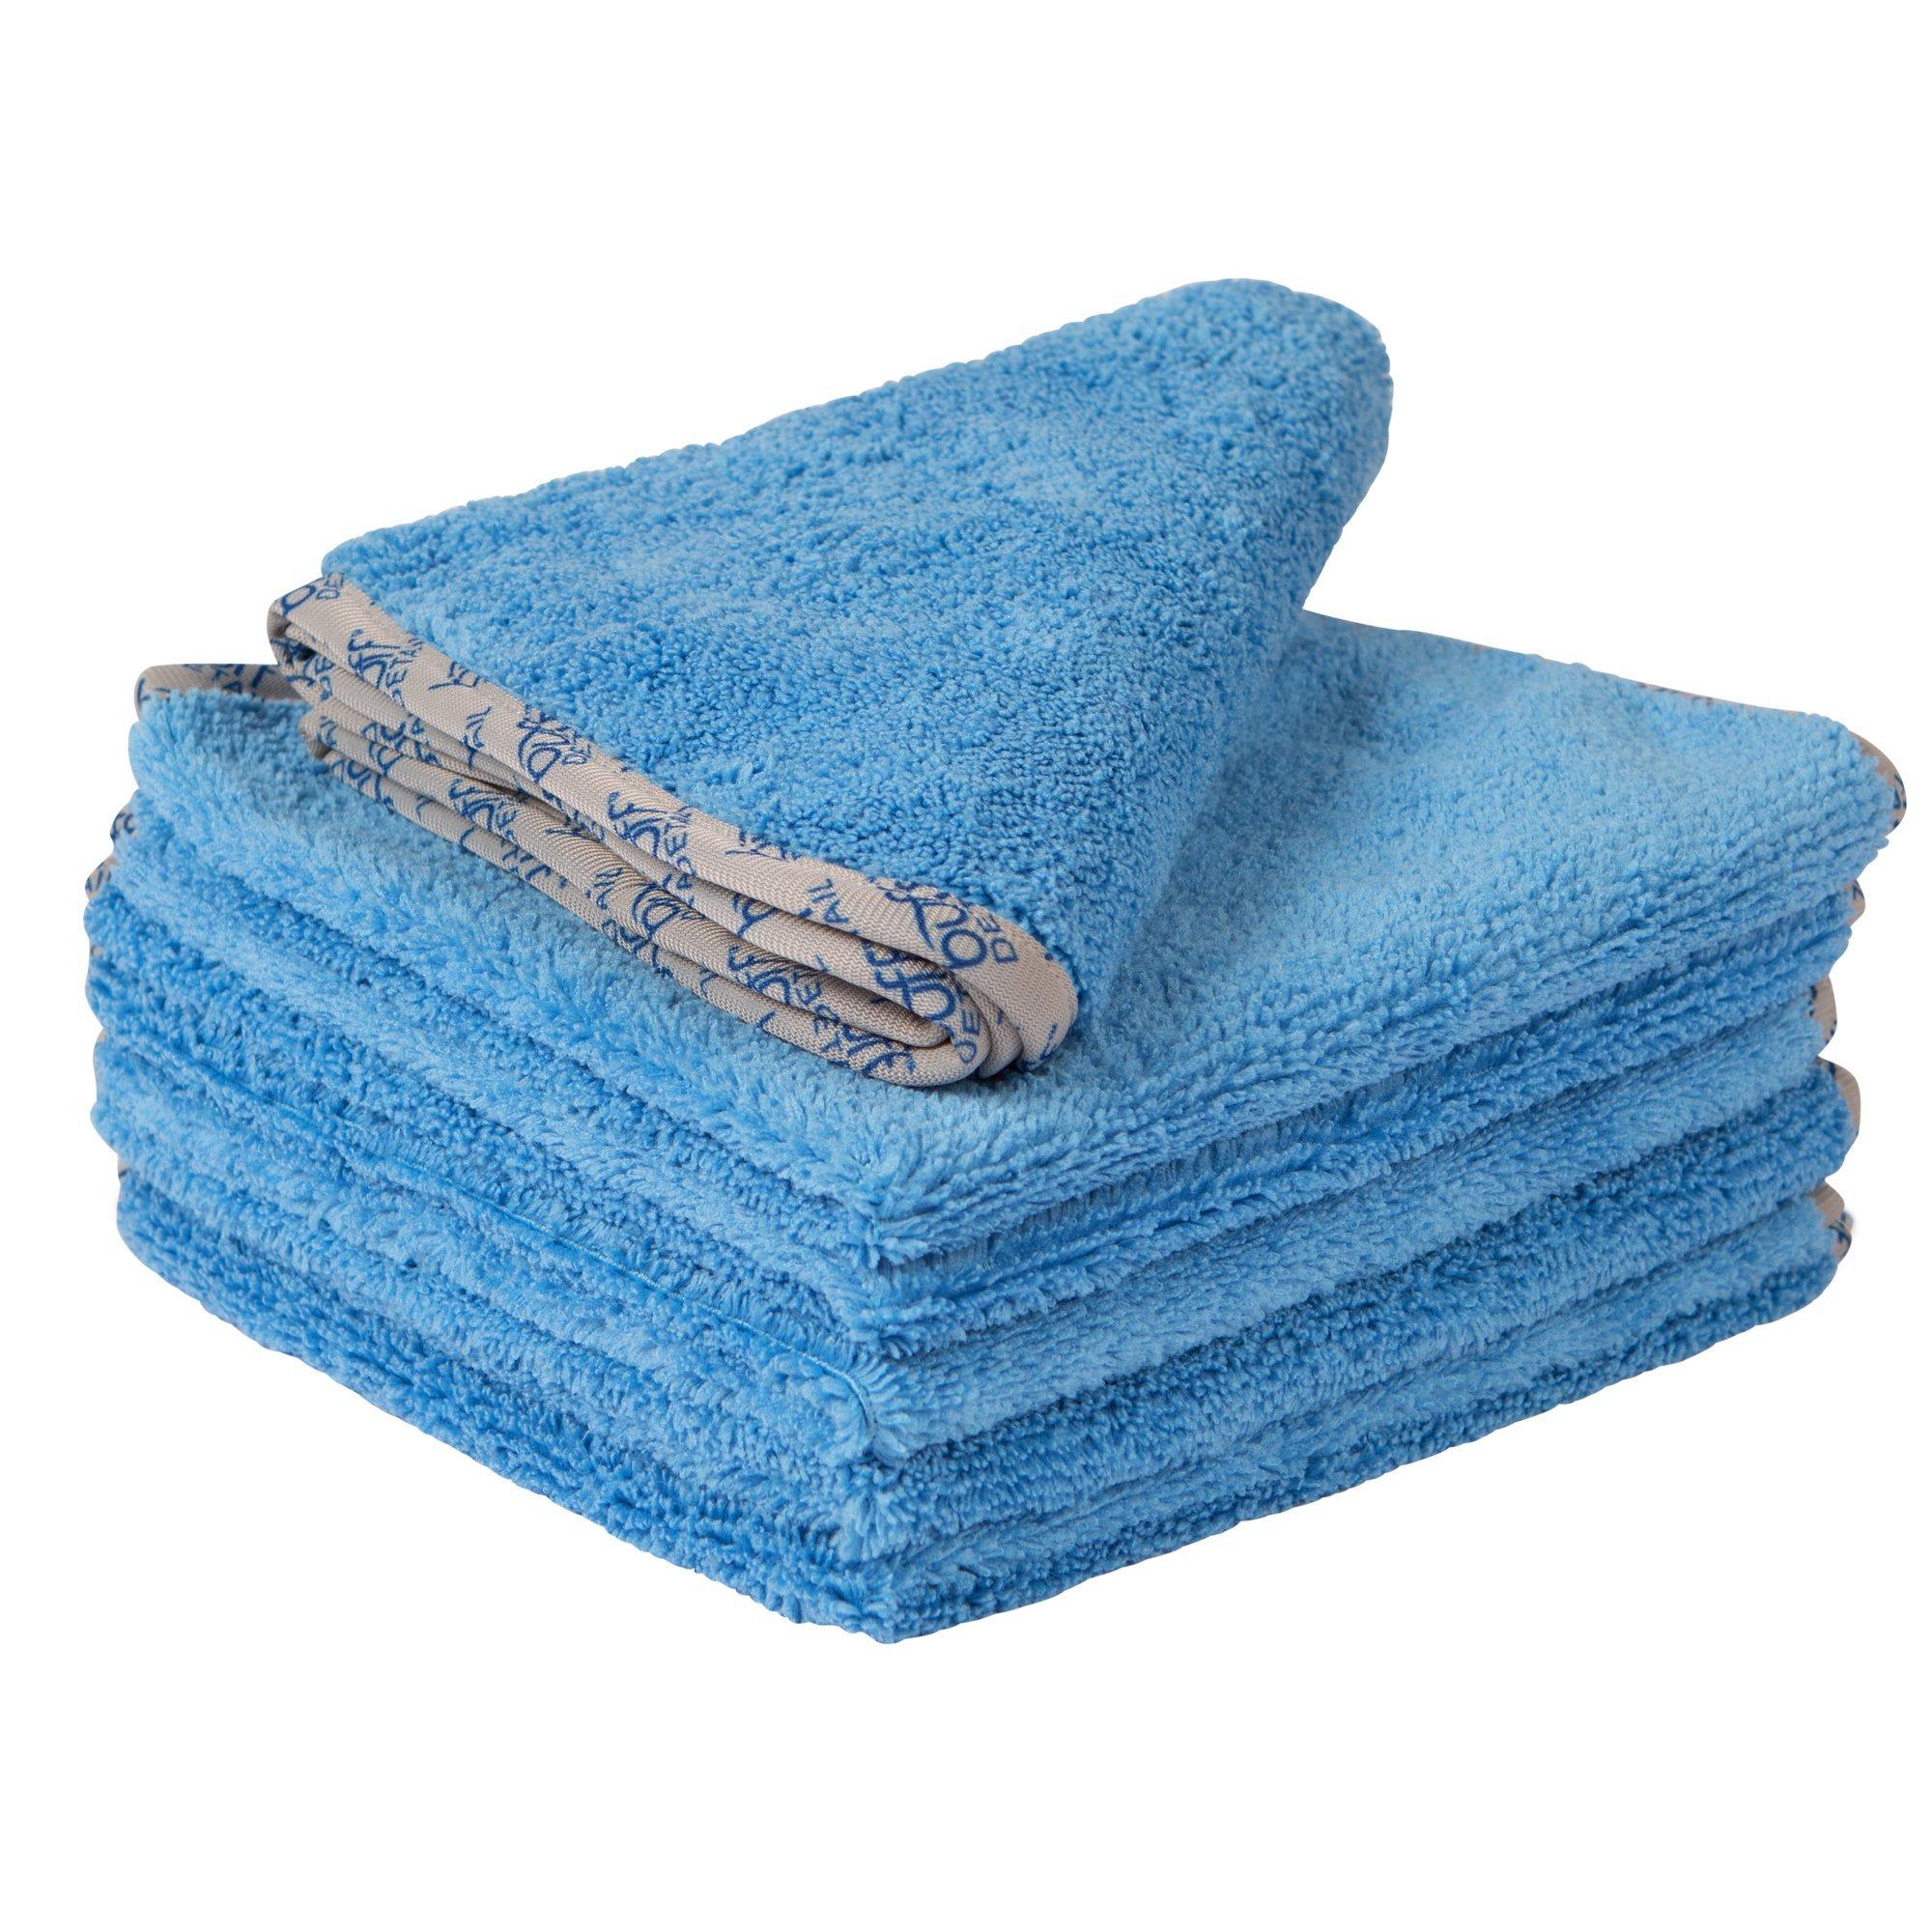 Buff Detail 400 Automotive Microfiber Towel | All-Purpose Auto Detailing - Wax Removal, Buff, Polish, Wash, Dry | Soft Satin Piped Edges | Streak Free Shine | 16''x16'' | 6 Pack (Blue)